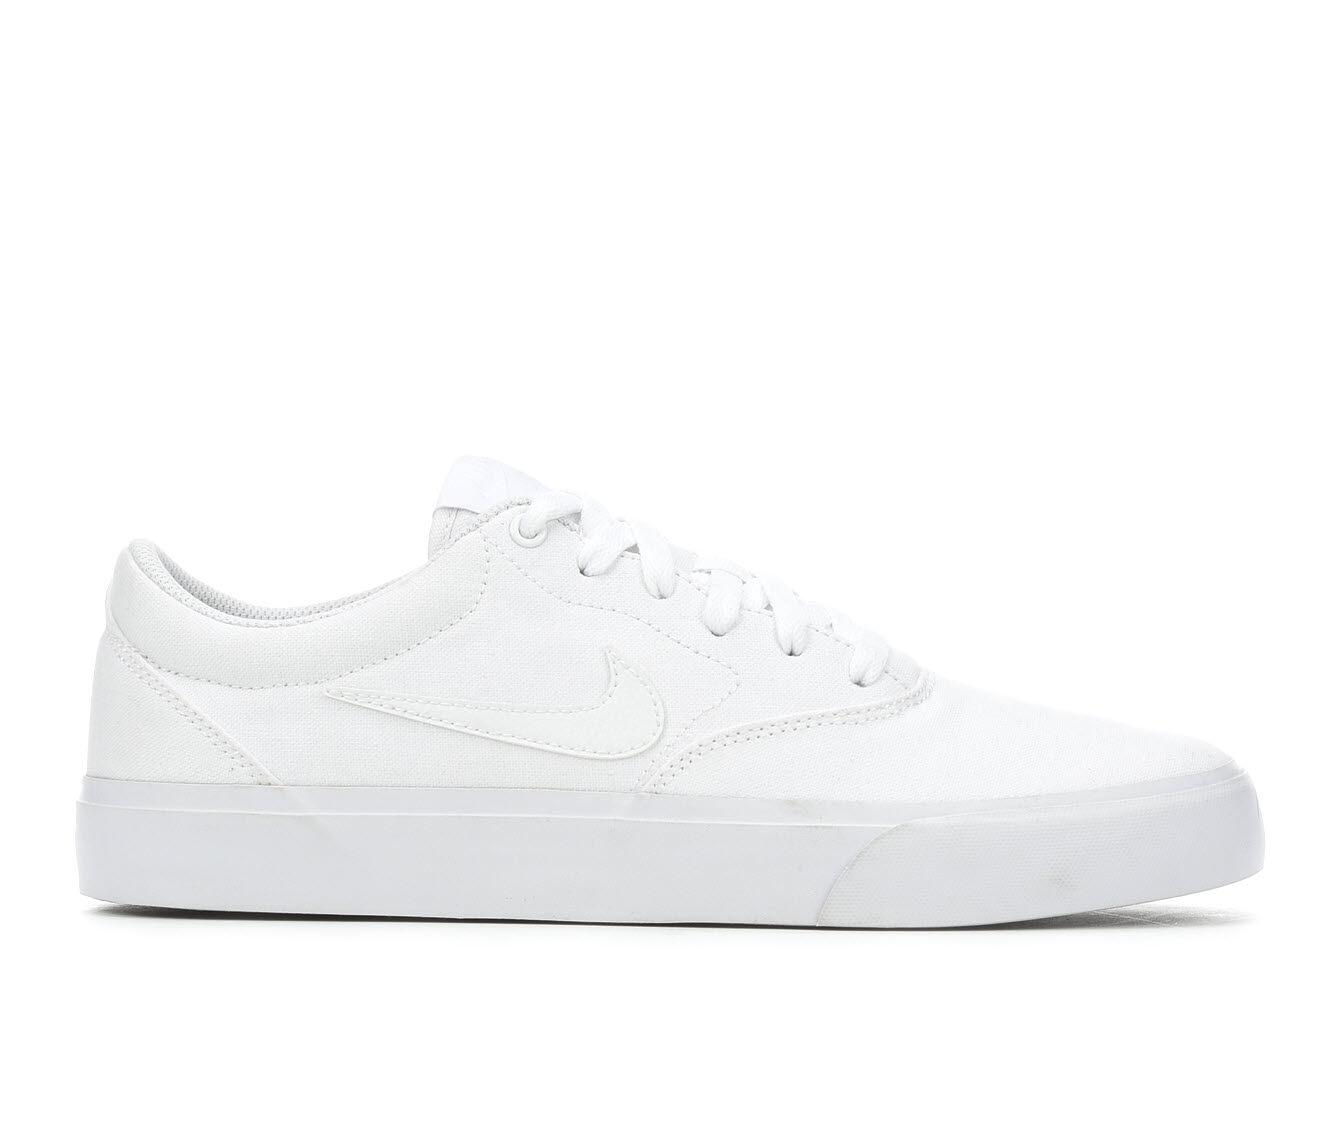 Nike SB Charge Skate Shoes   Shoe Carnival